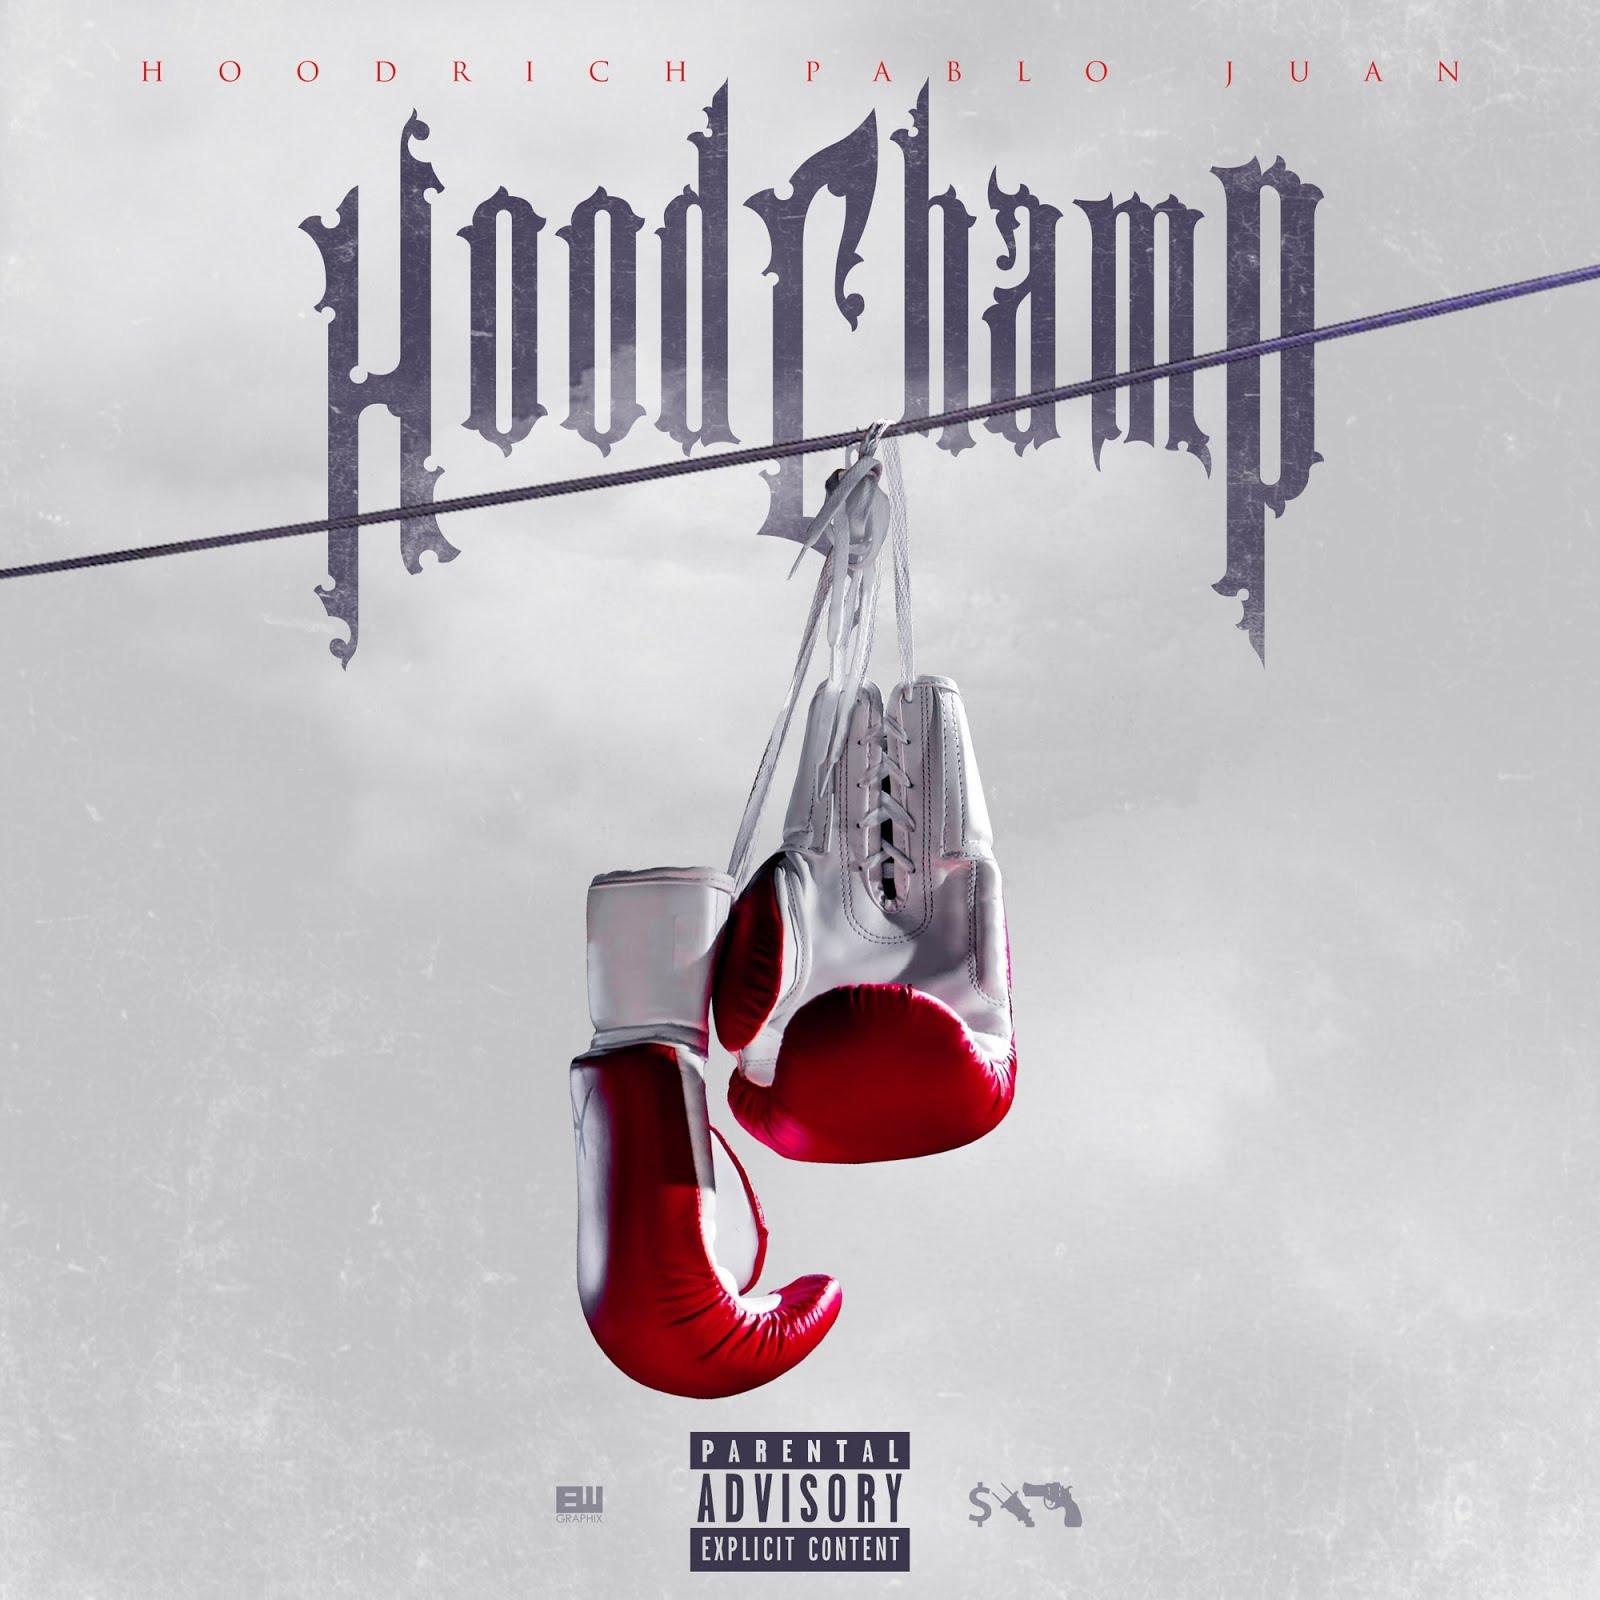 HoodRich Pablo Juan – Hood Champ